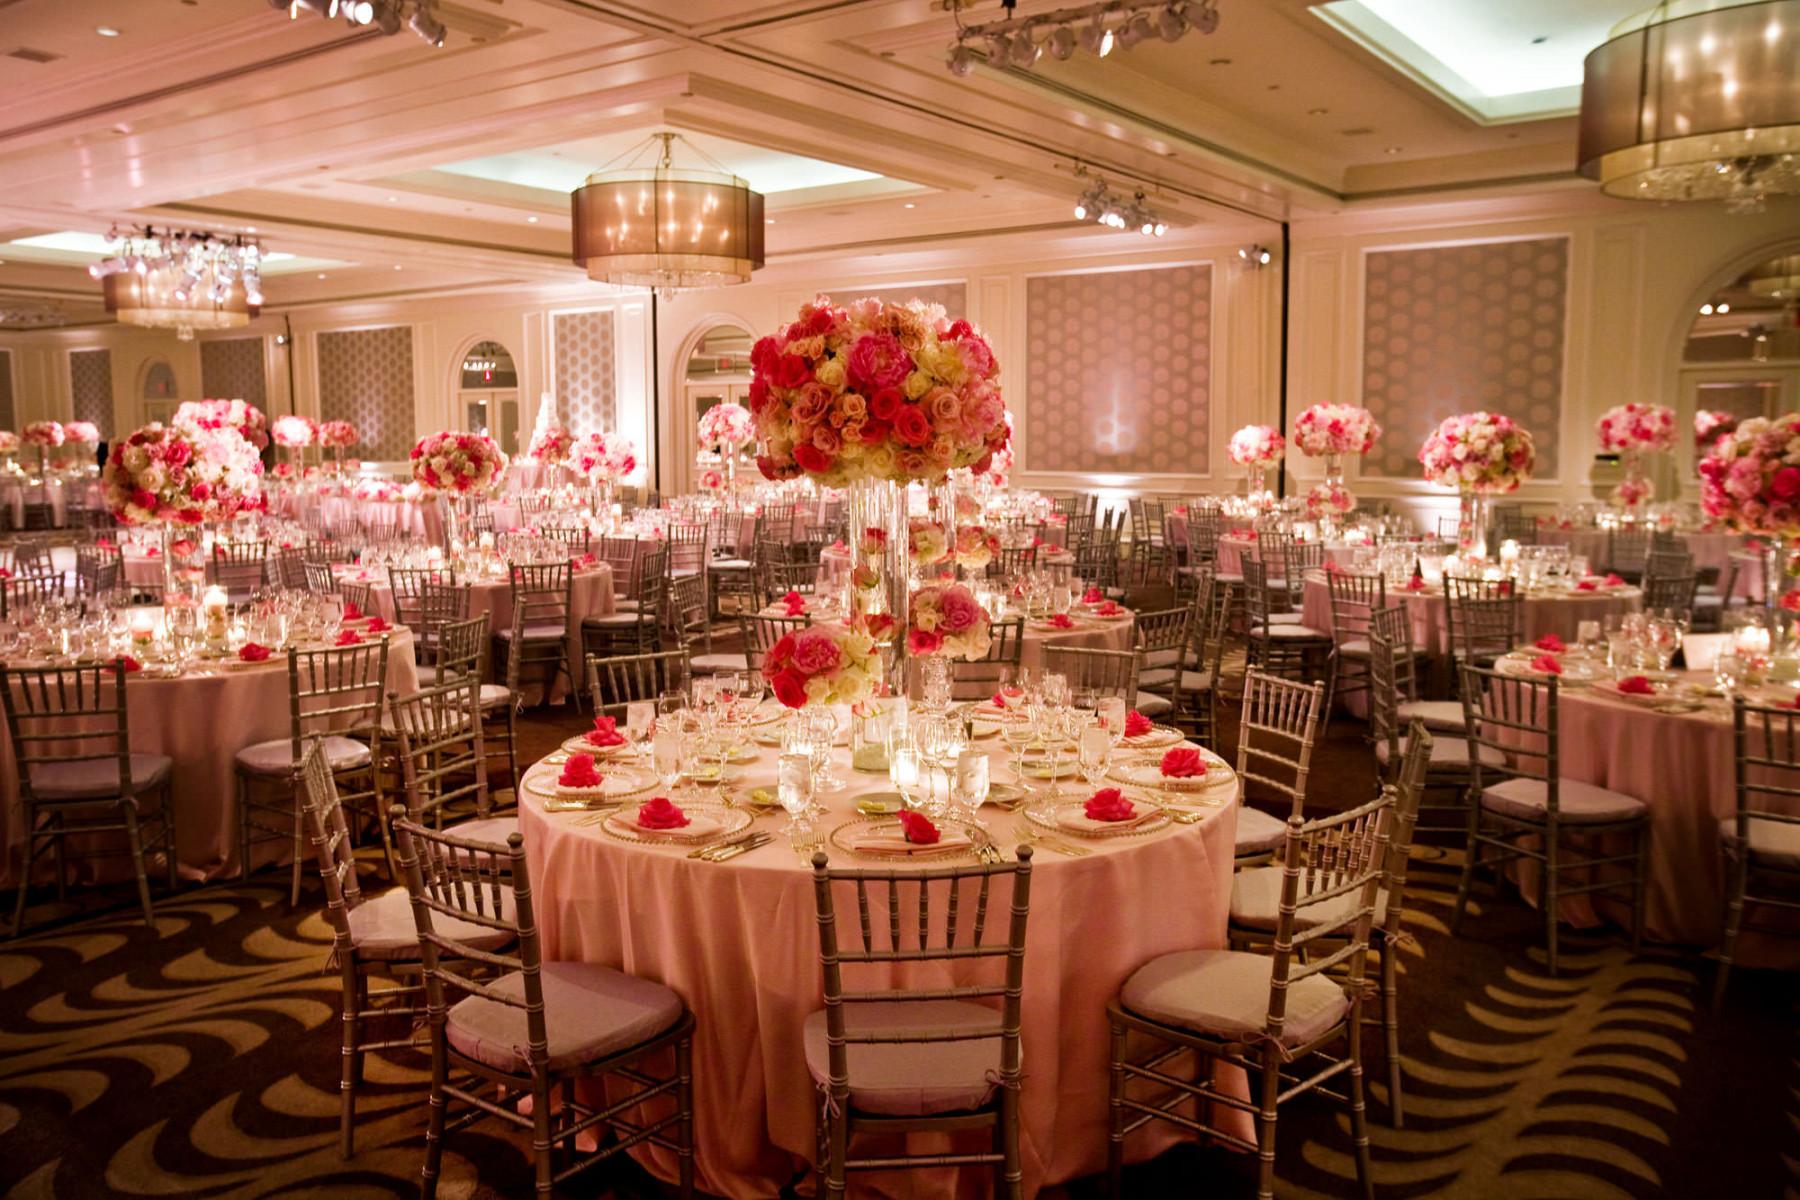 Christine-and-Buddy-wedding-Ritz-Carlton-Laguna-10-web